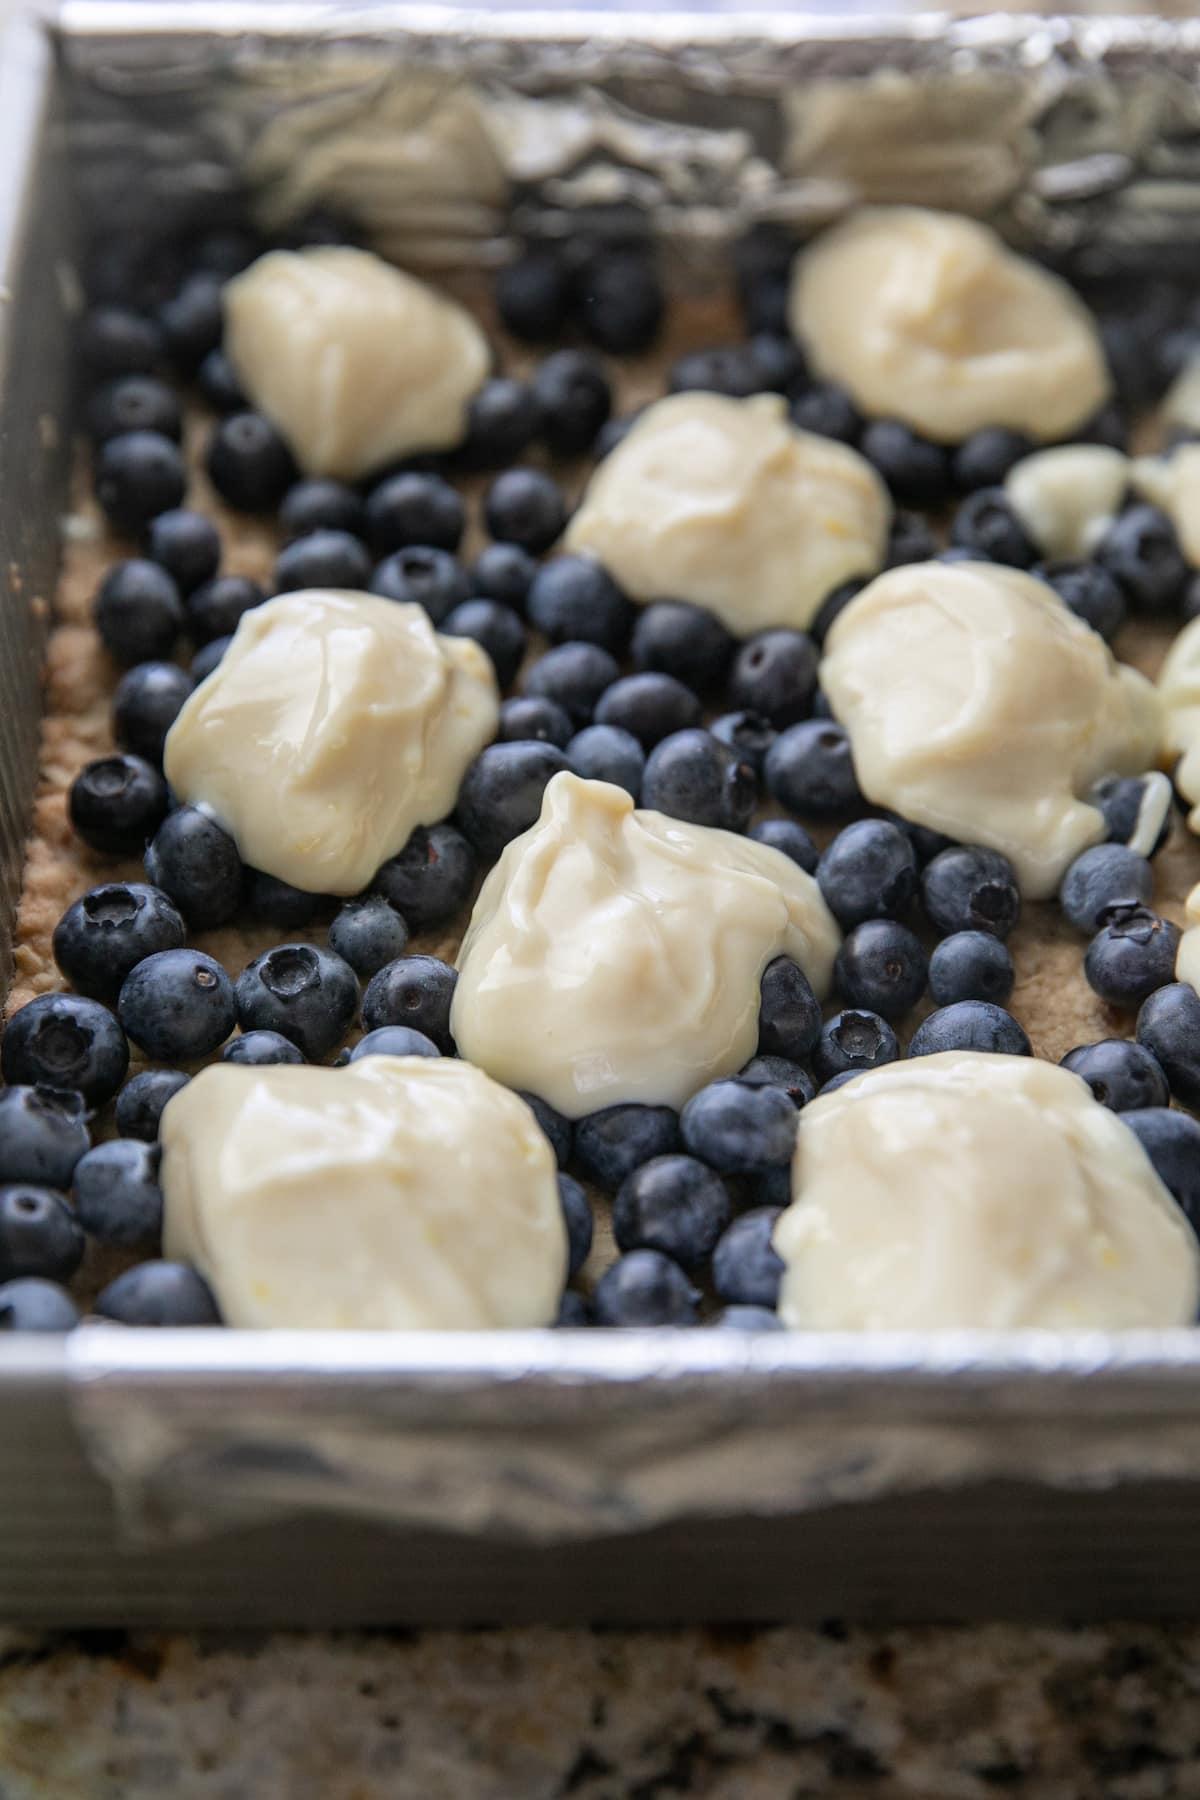 dollops of lemon mixture topping blueberries in a baking pan